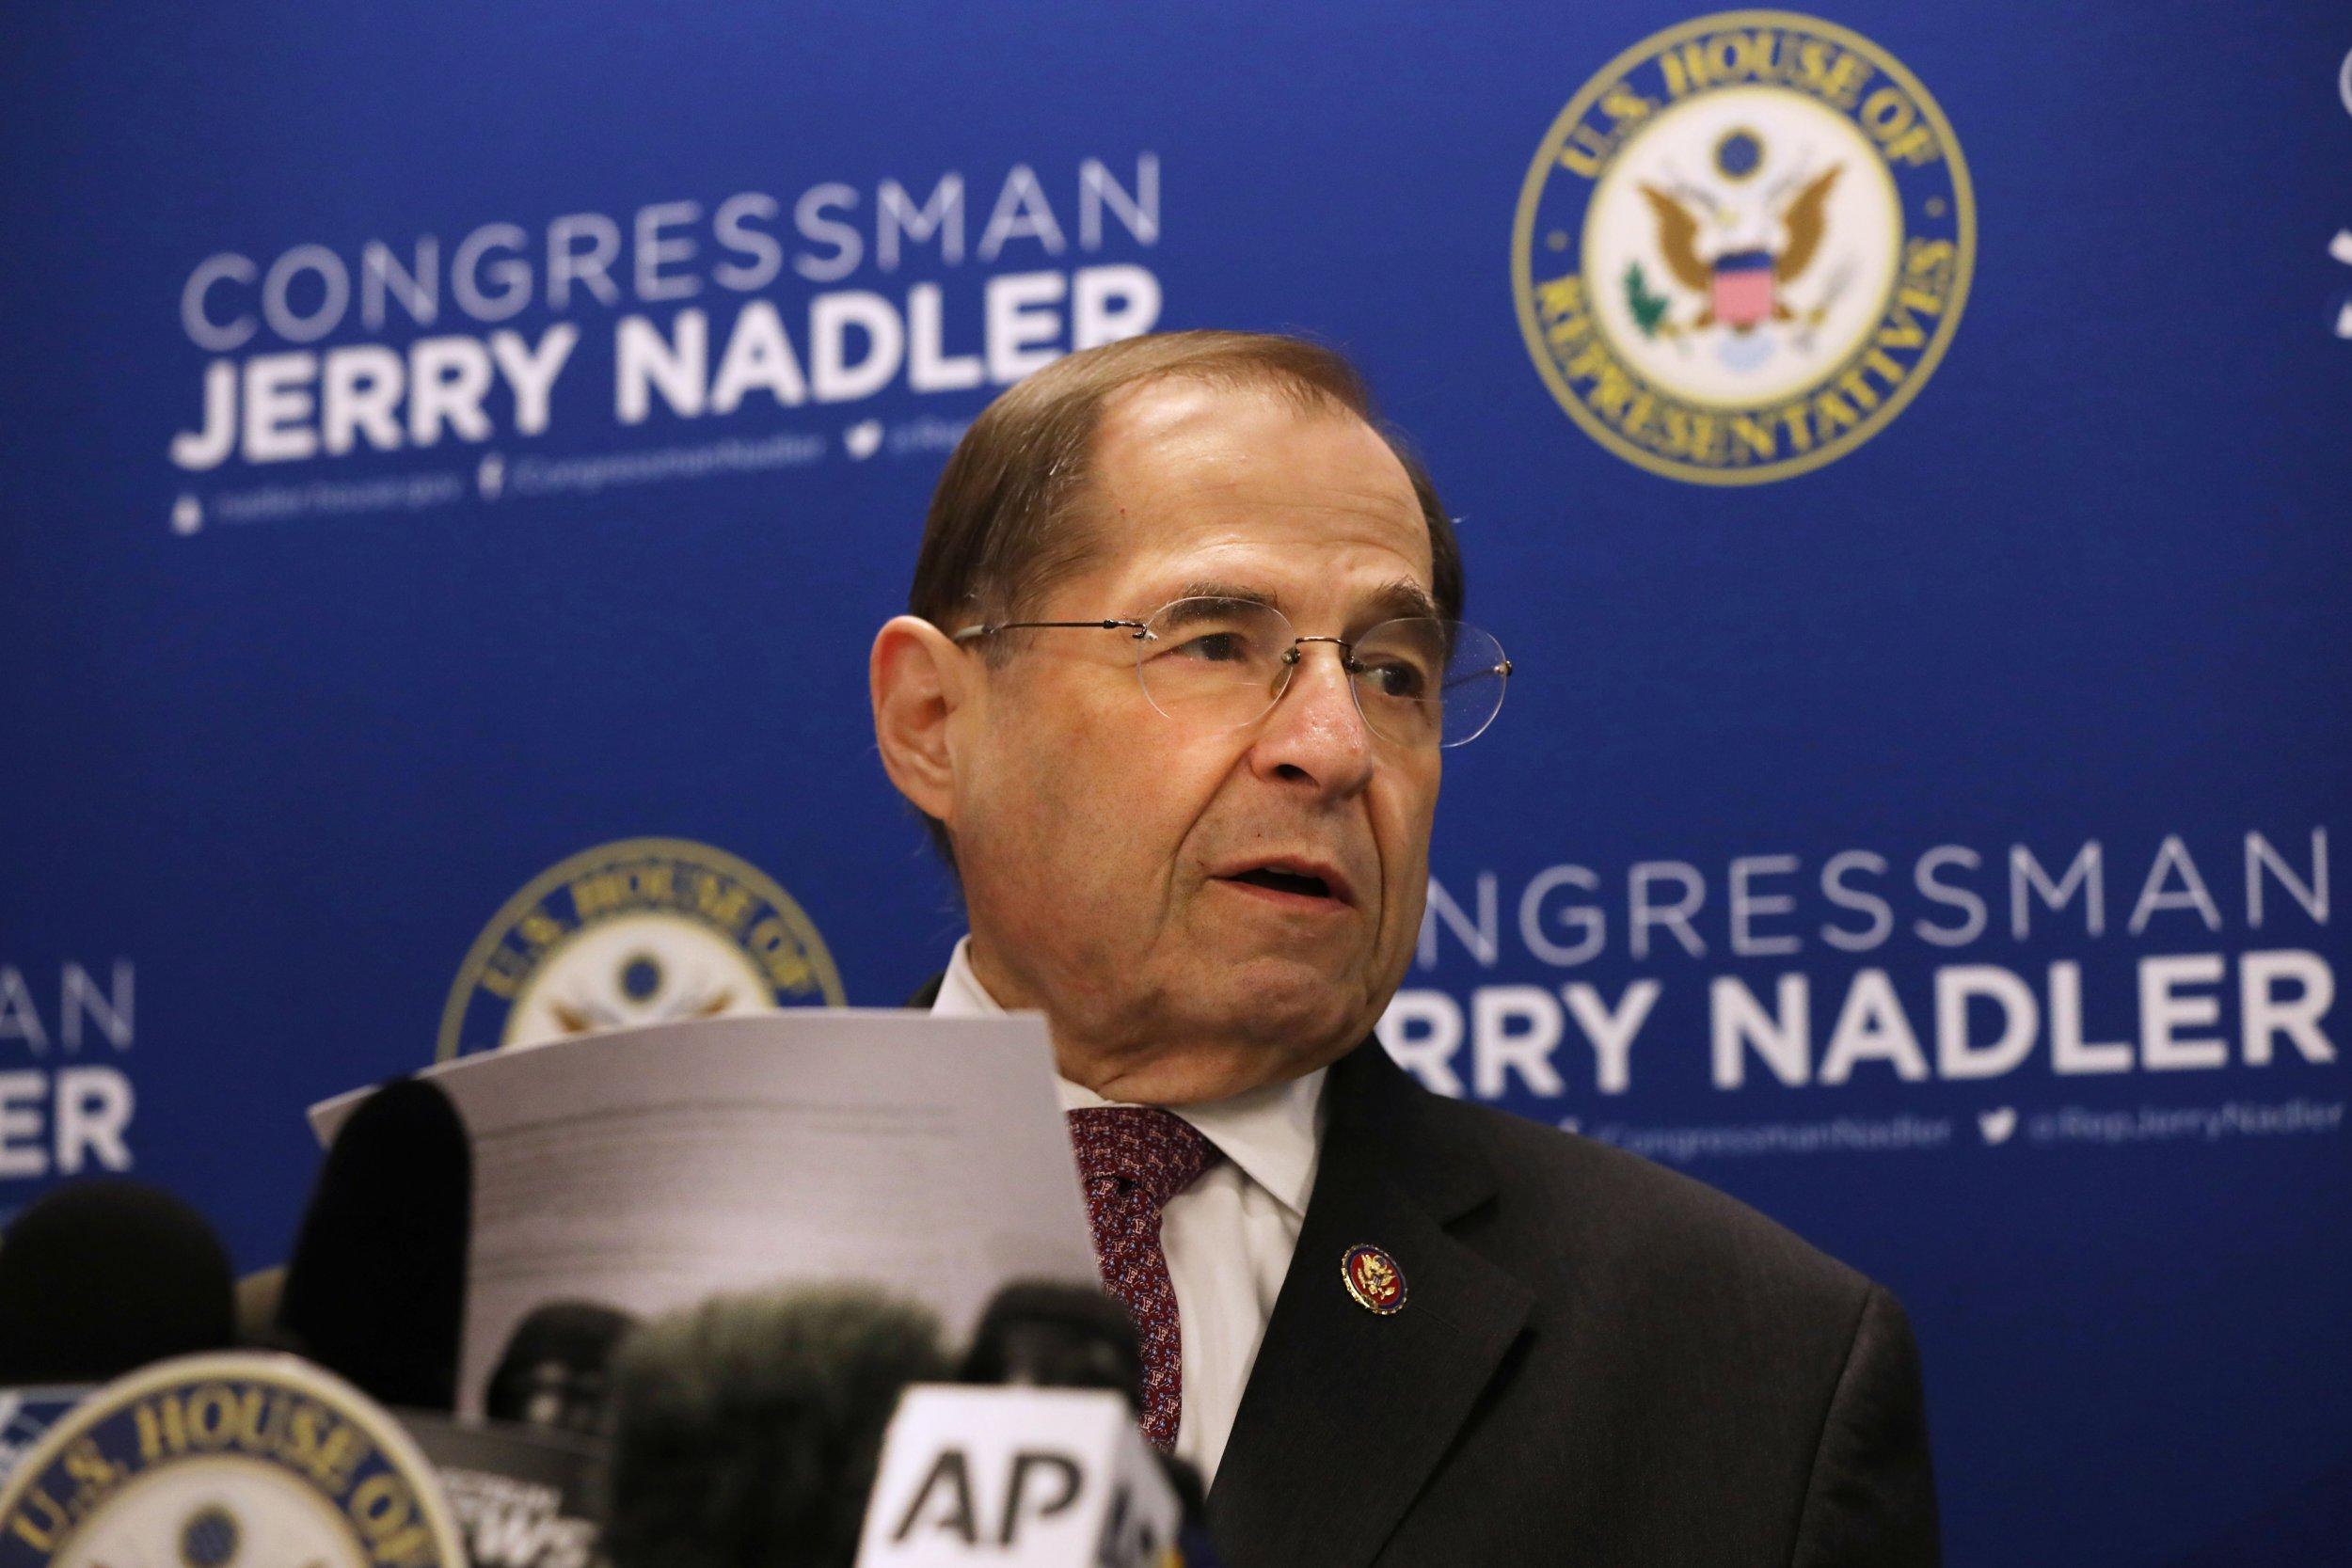 Jerry Nadler, Mueller report, Trump impeachment